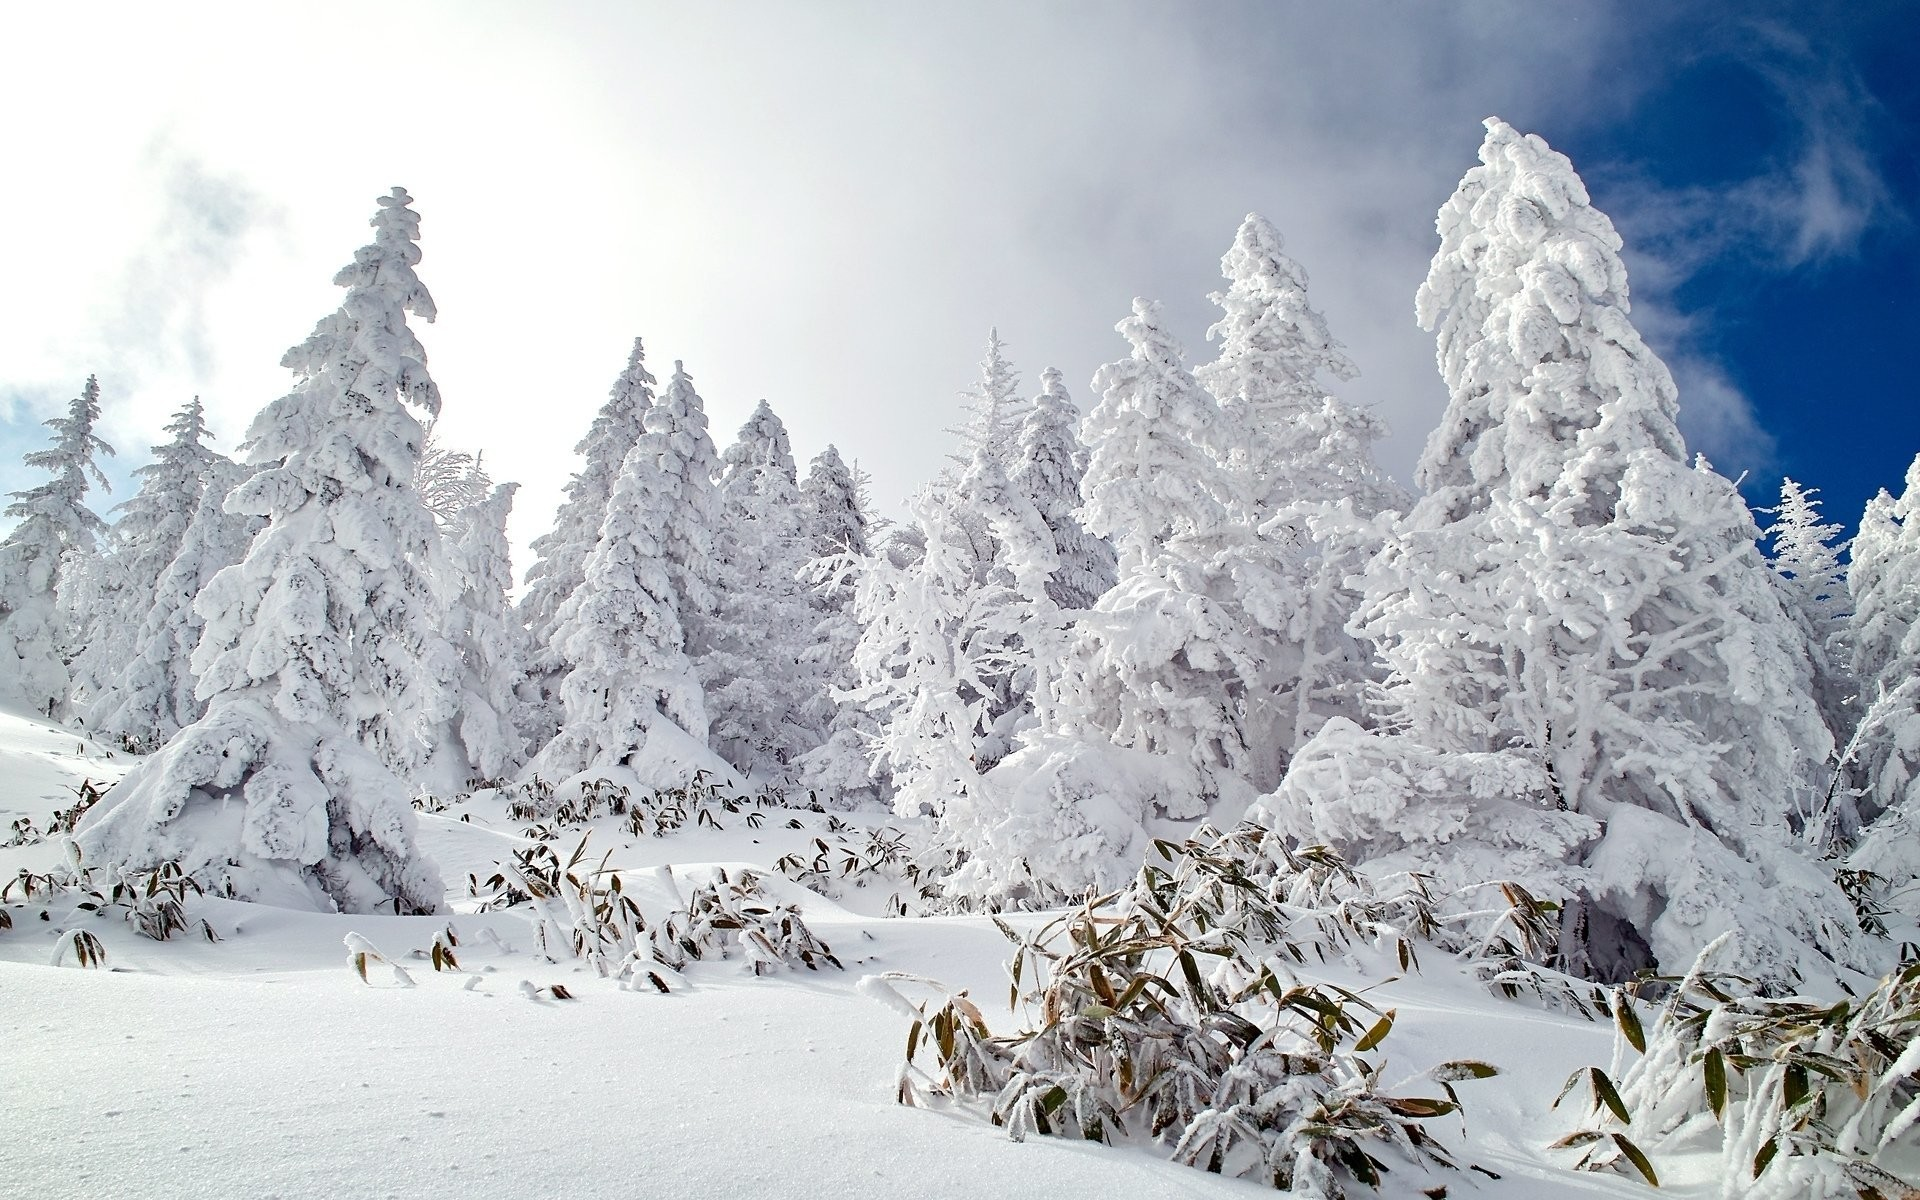 Falling Snow Wallpaper For Ipad Beautiful Snow Wallpapers 183 ① Wallpapertag